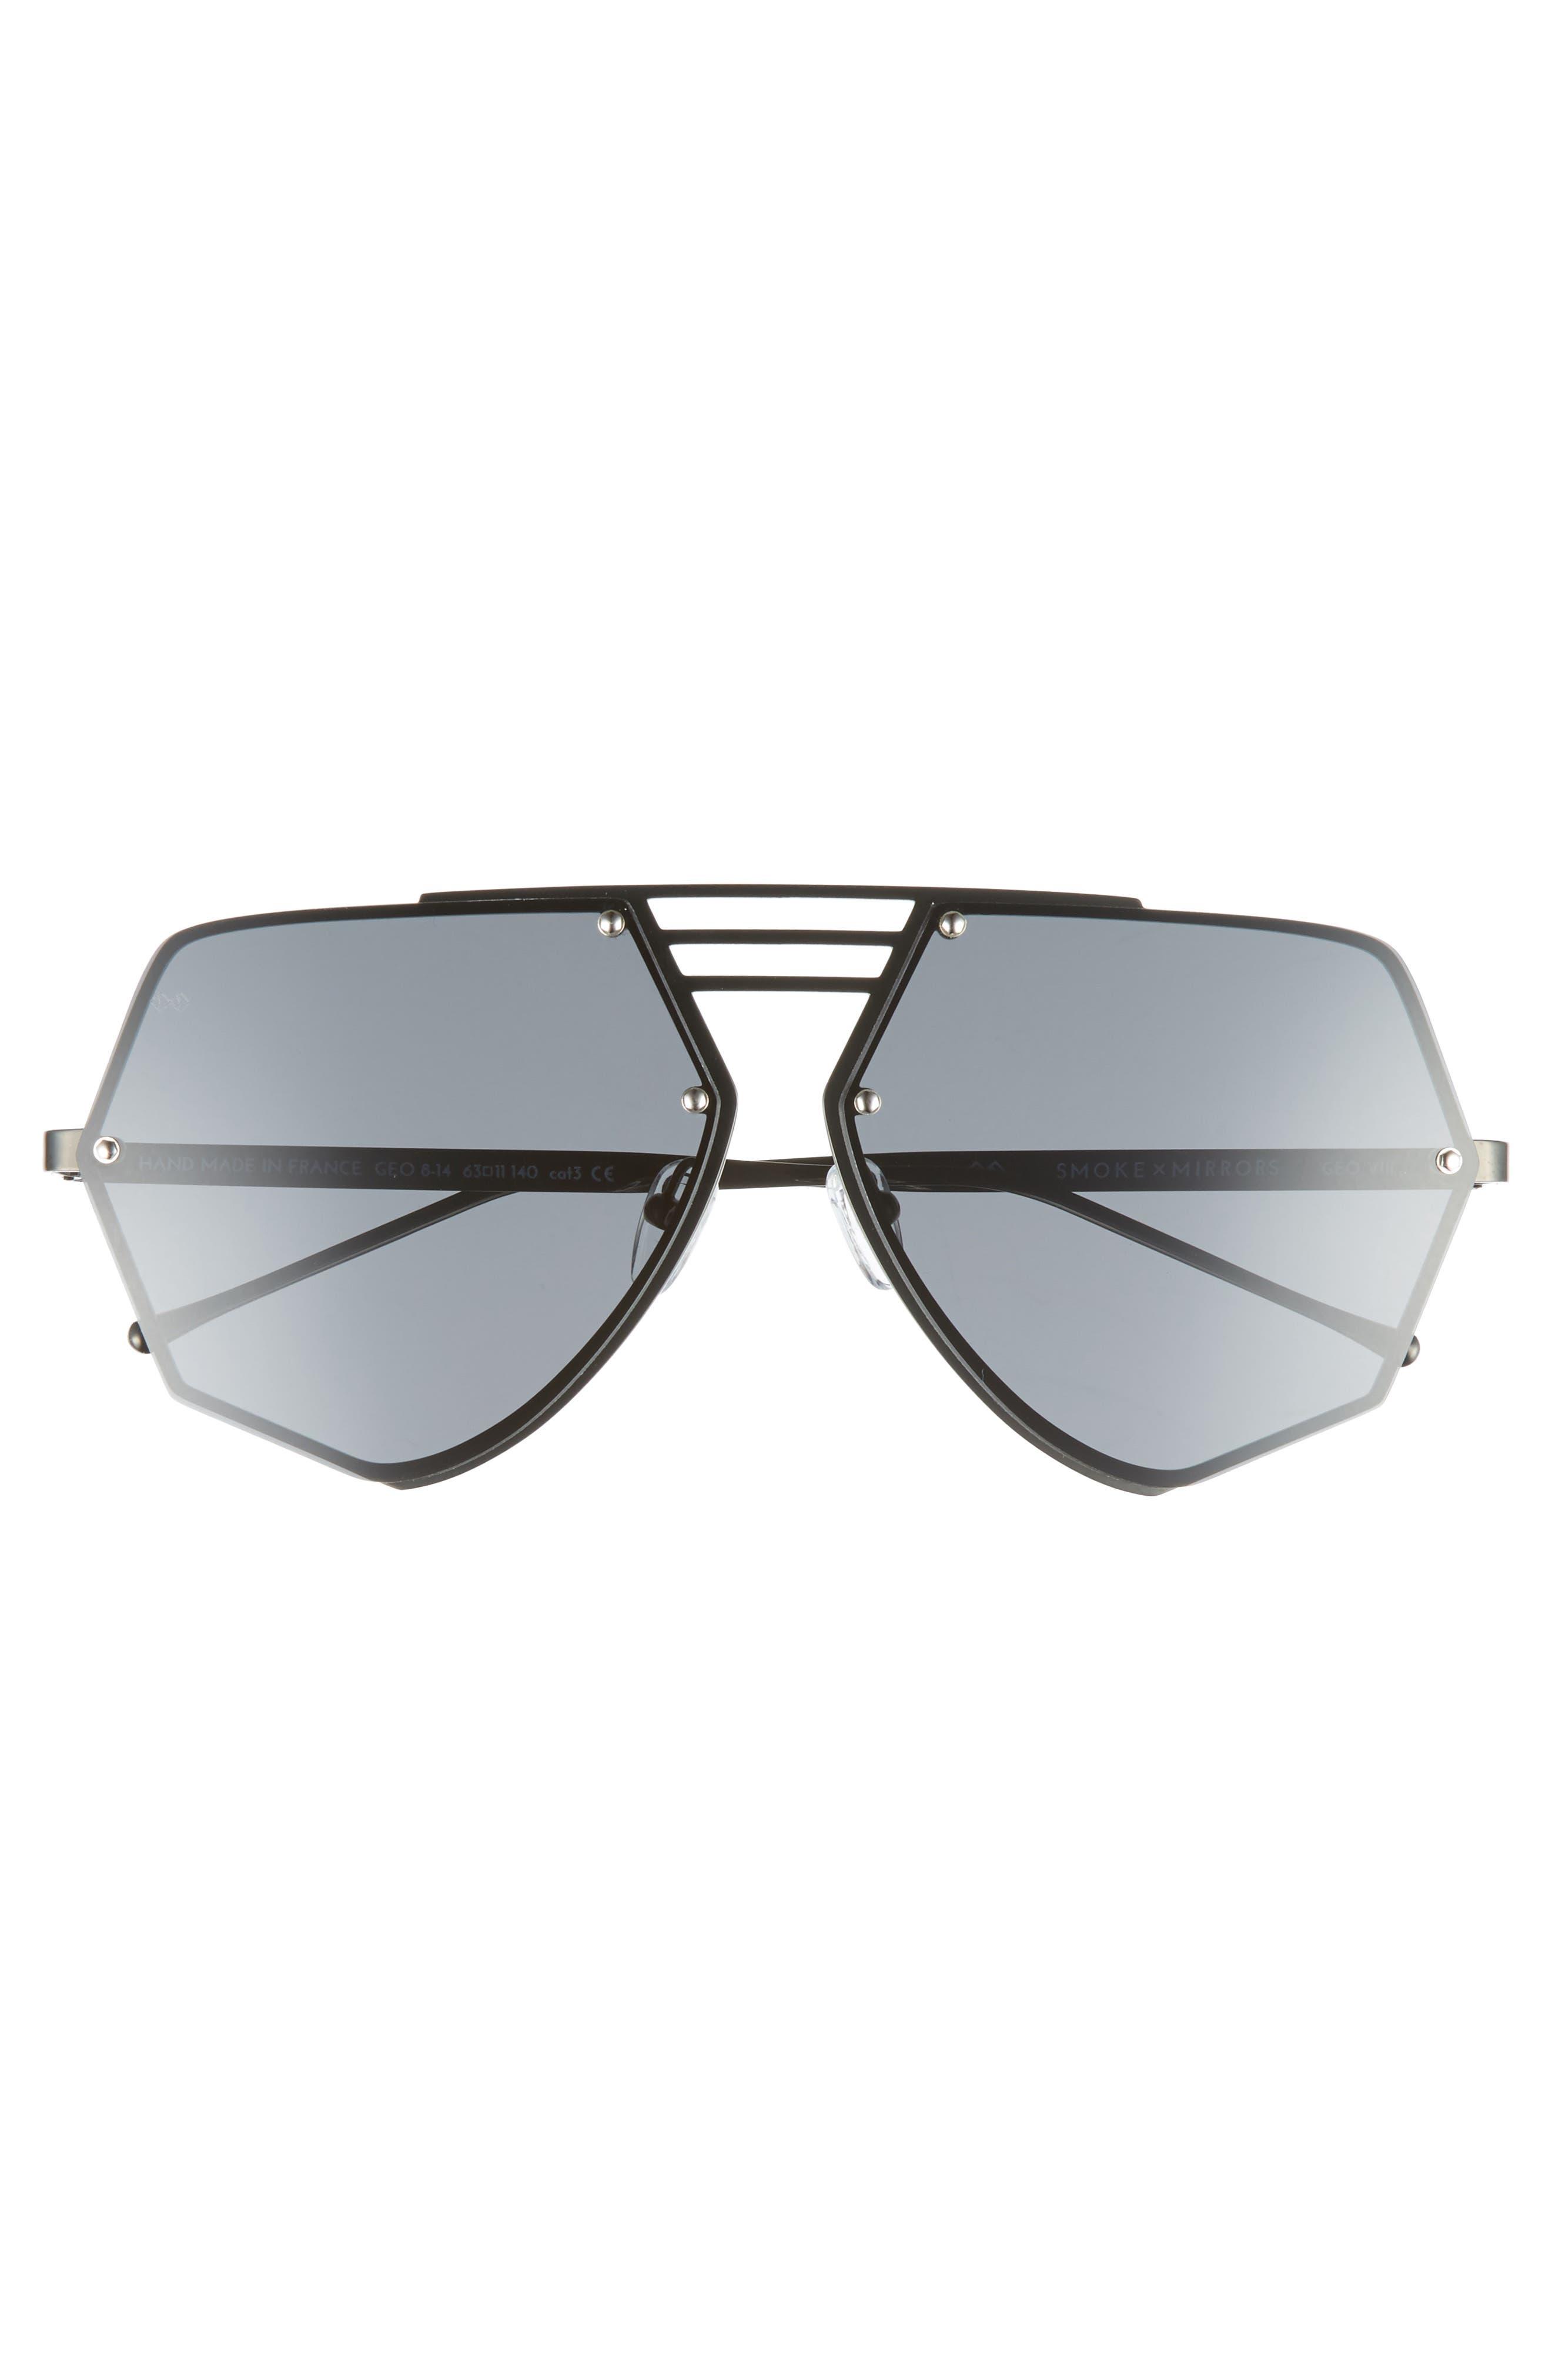 Geo VIII 63mm Sunglasses,                             Alternate thumbnail 2, color,                             Dark Gunmetal/ Dark Grey